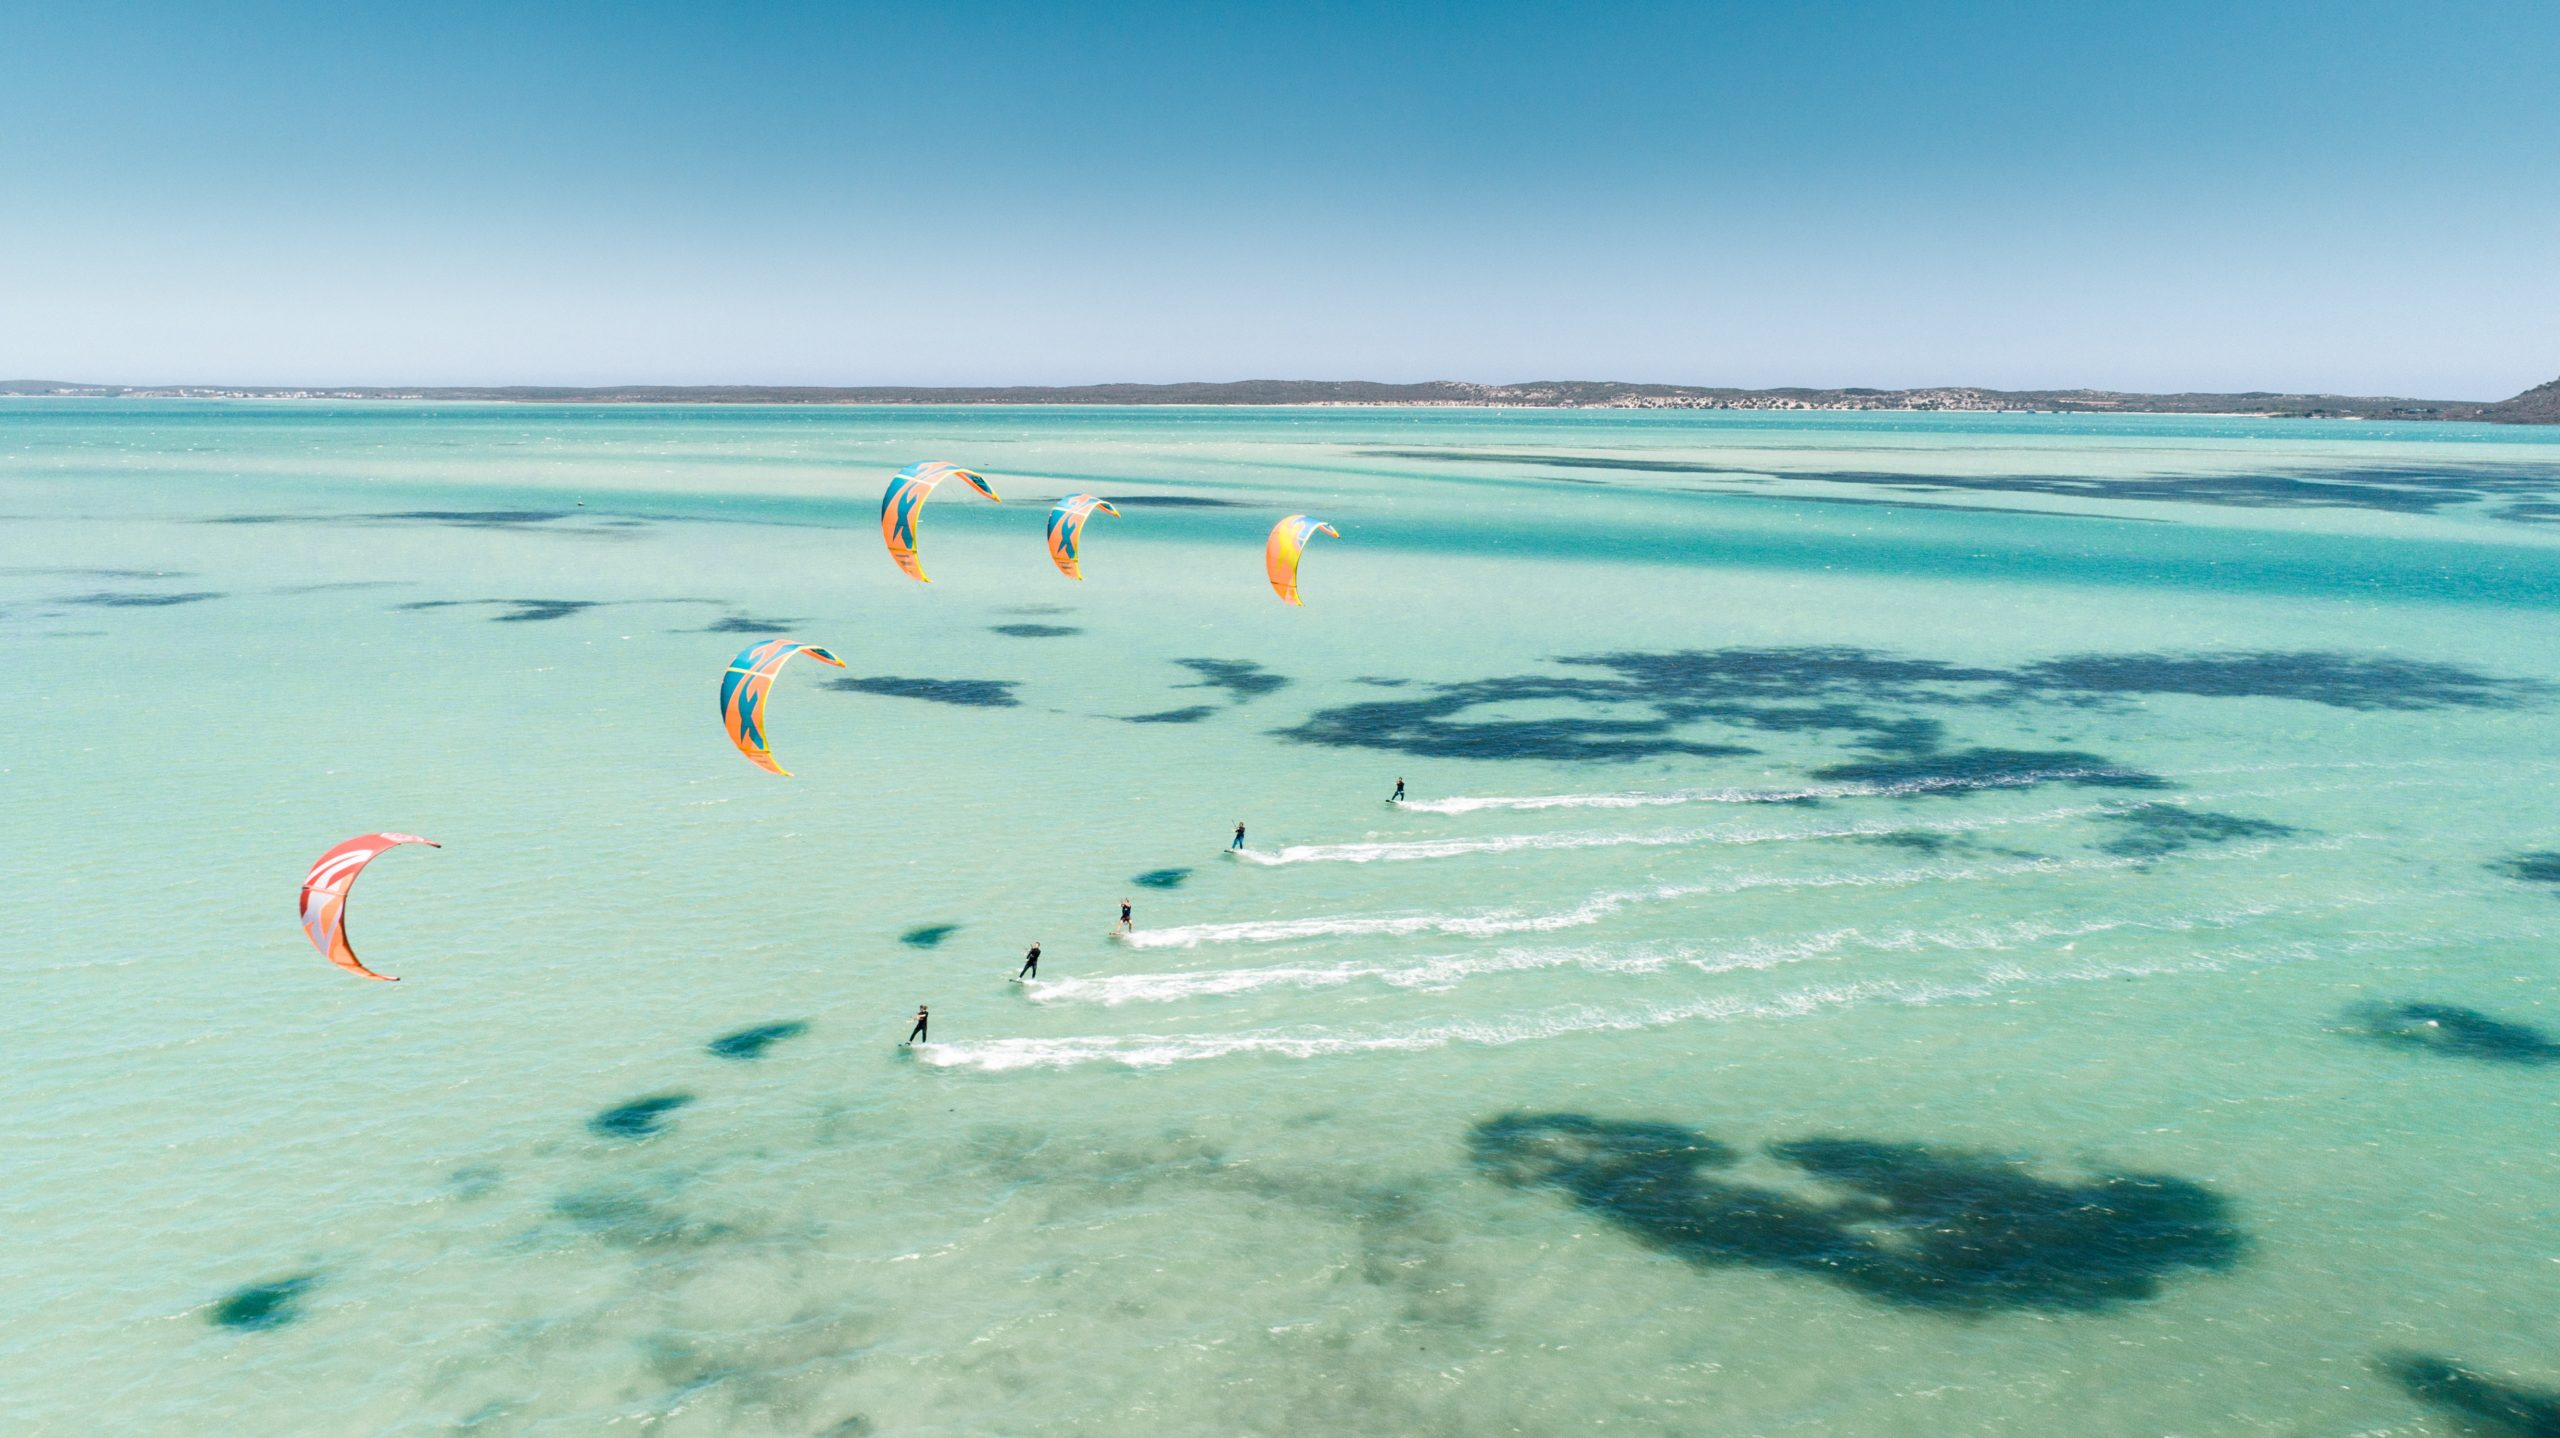 kitesurf-activité-plein-air